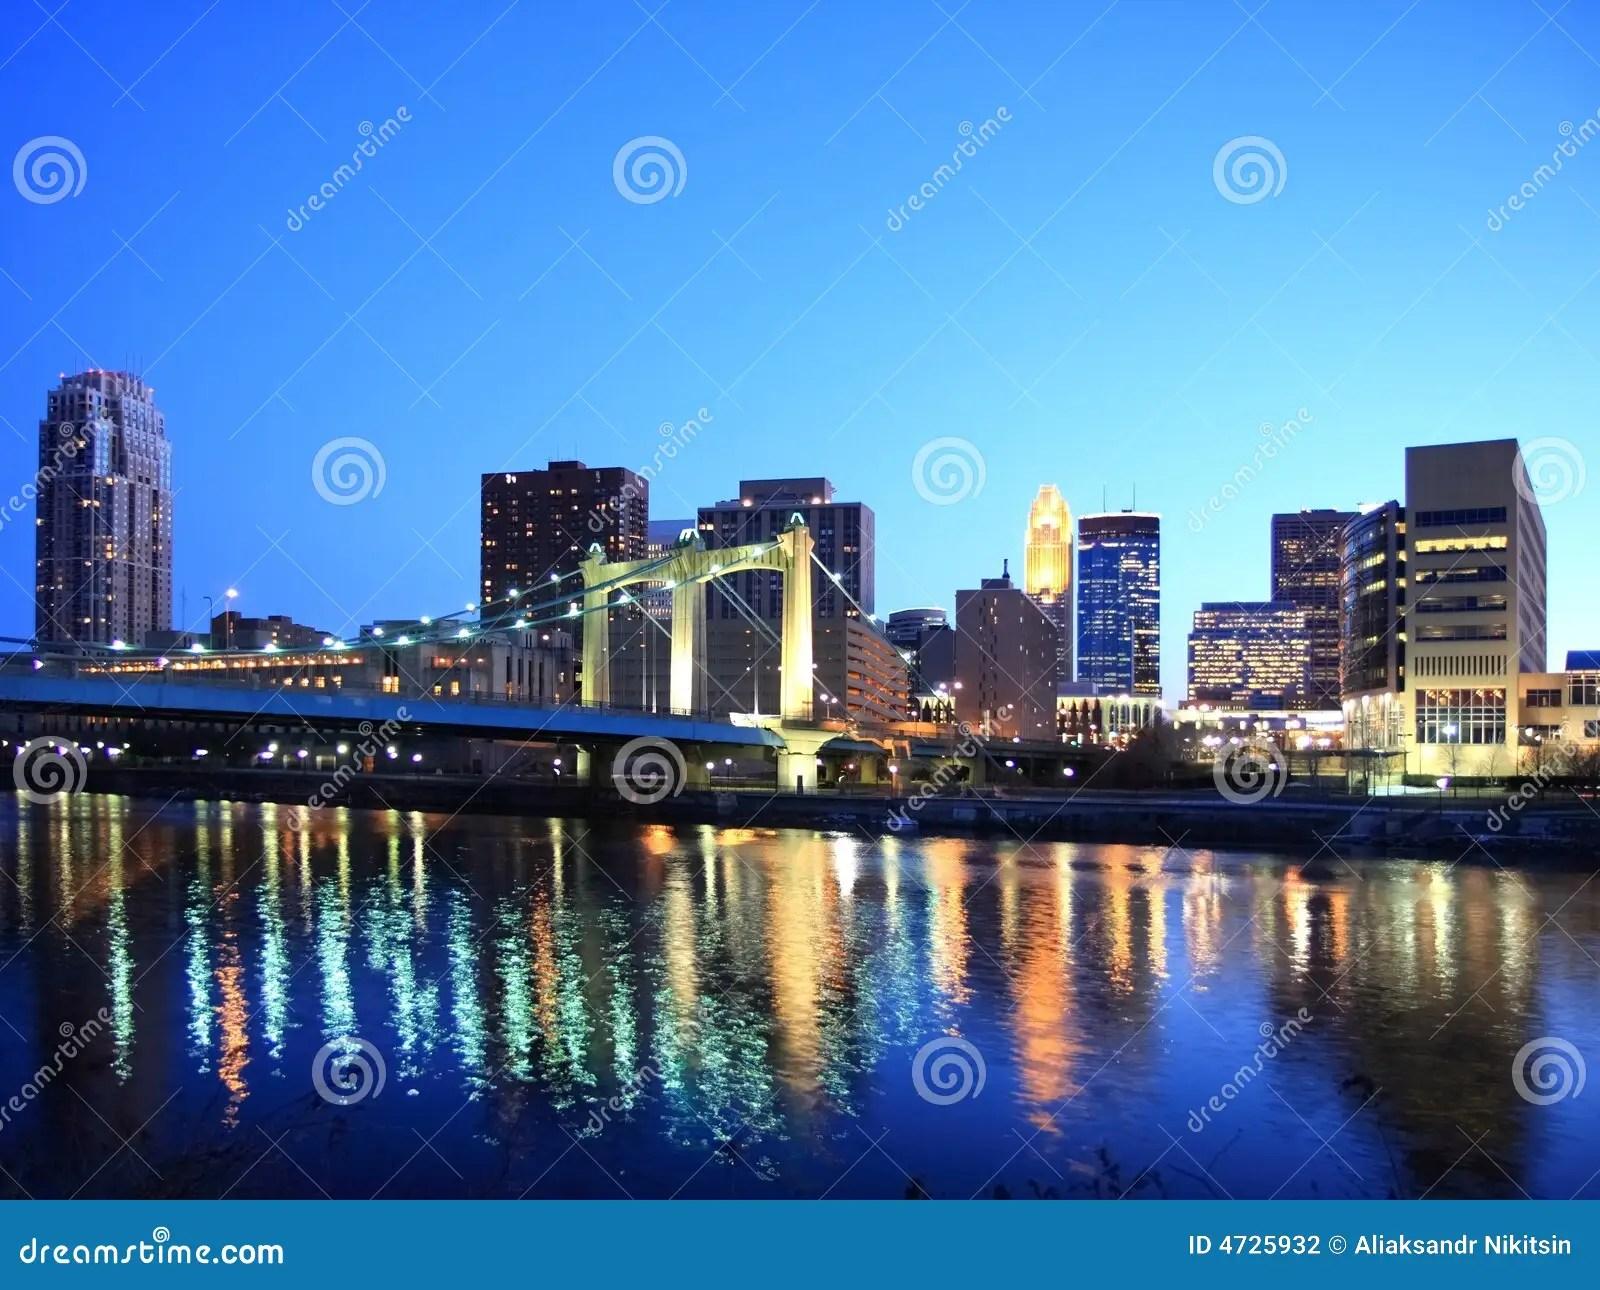 Downtown Minneapolis At Night Stock Photo  Image 4725932